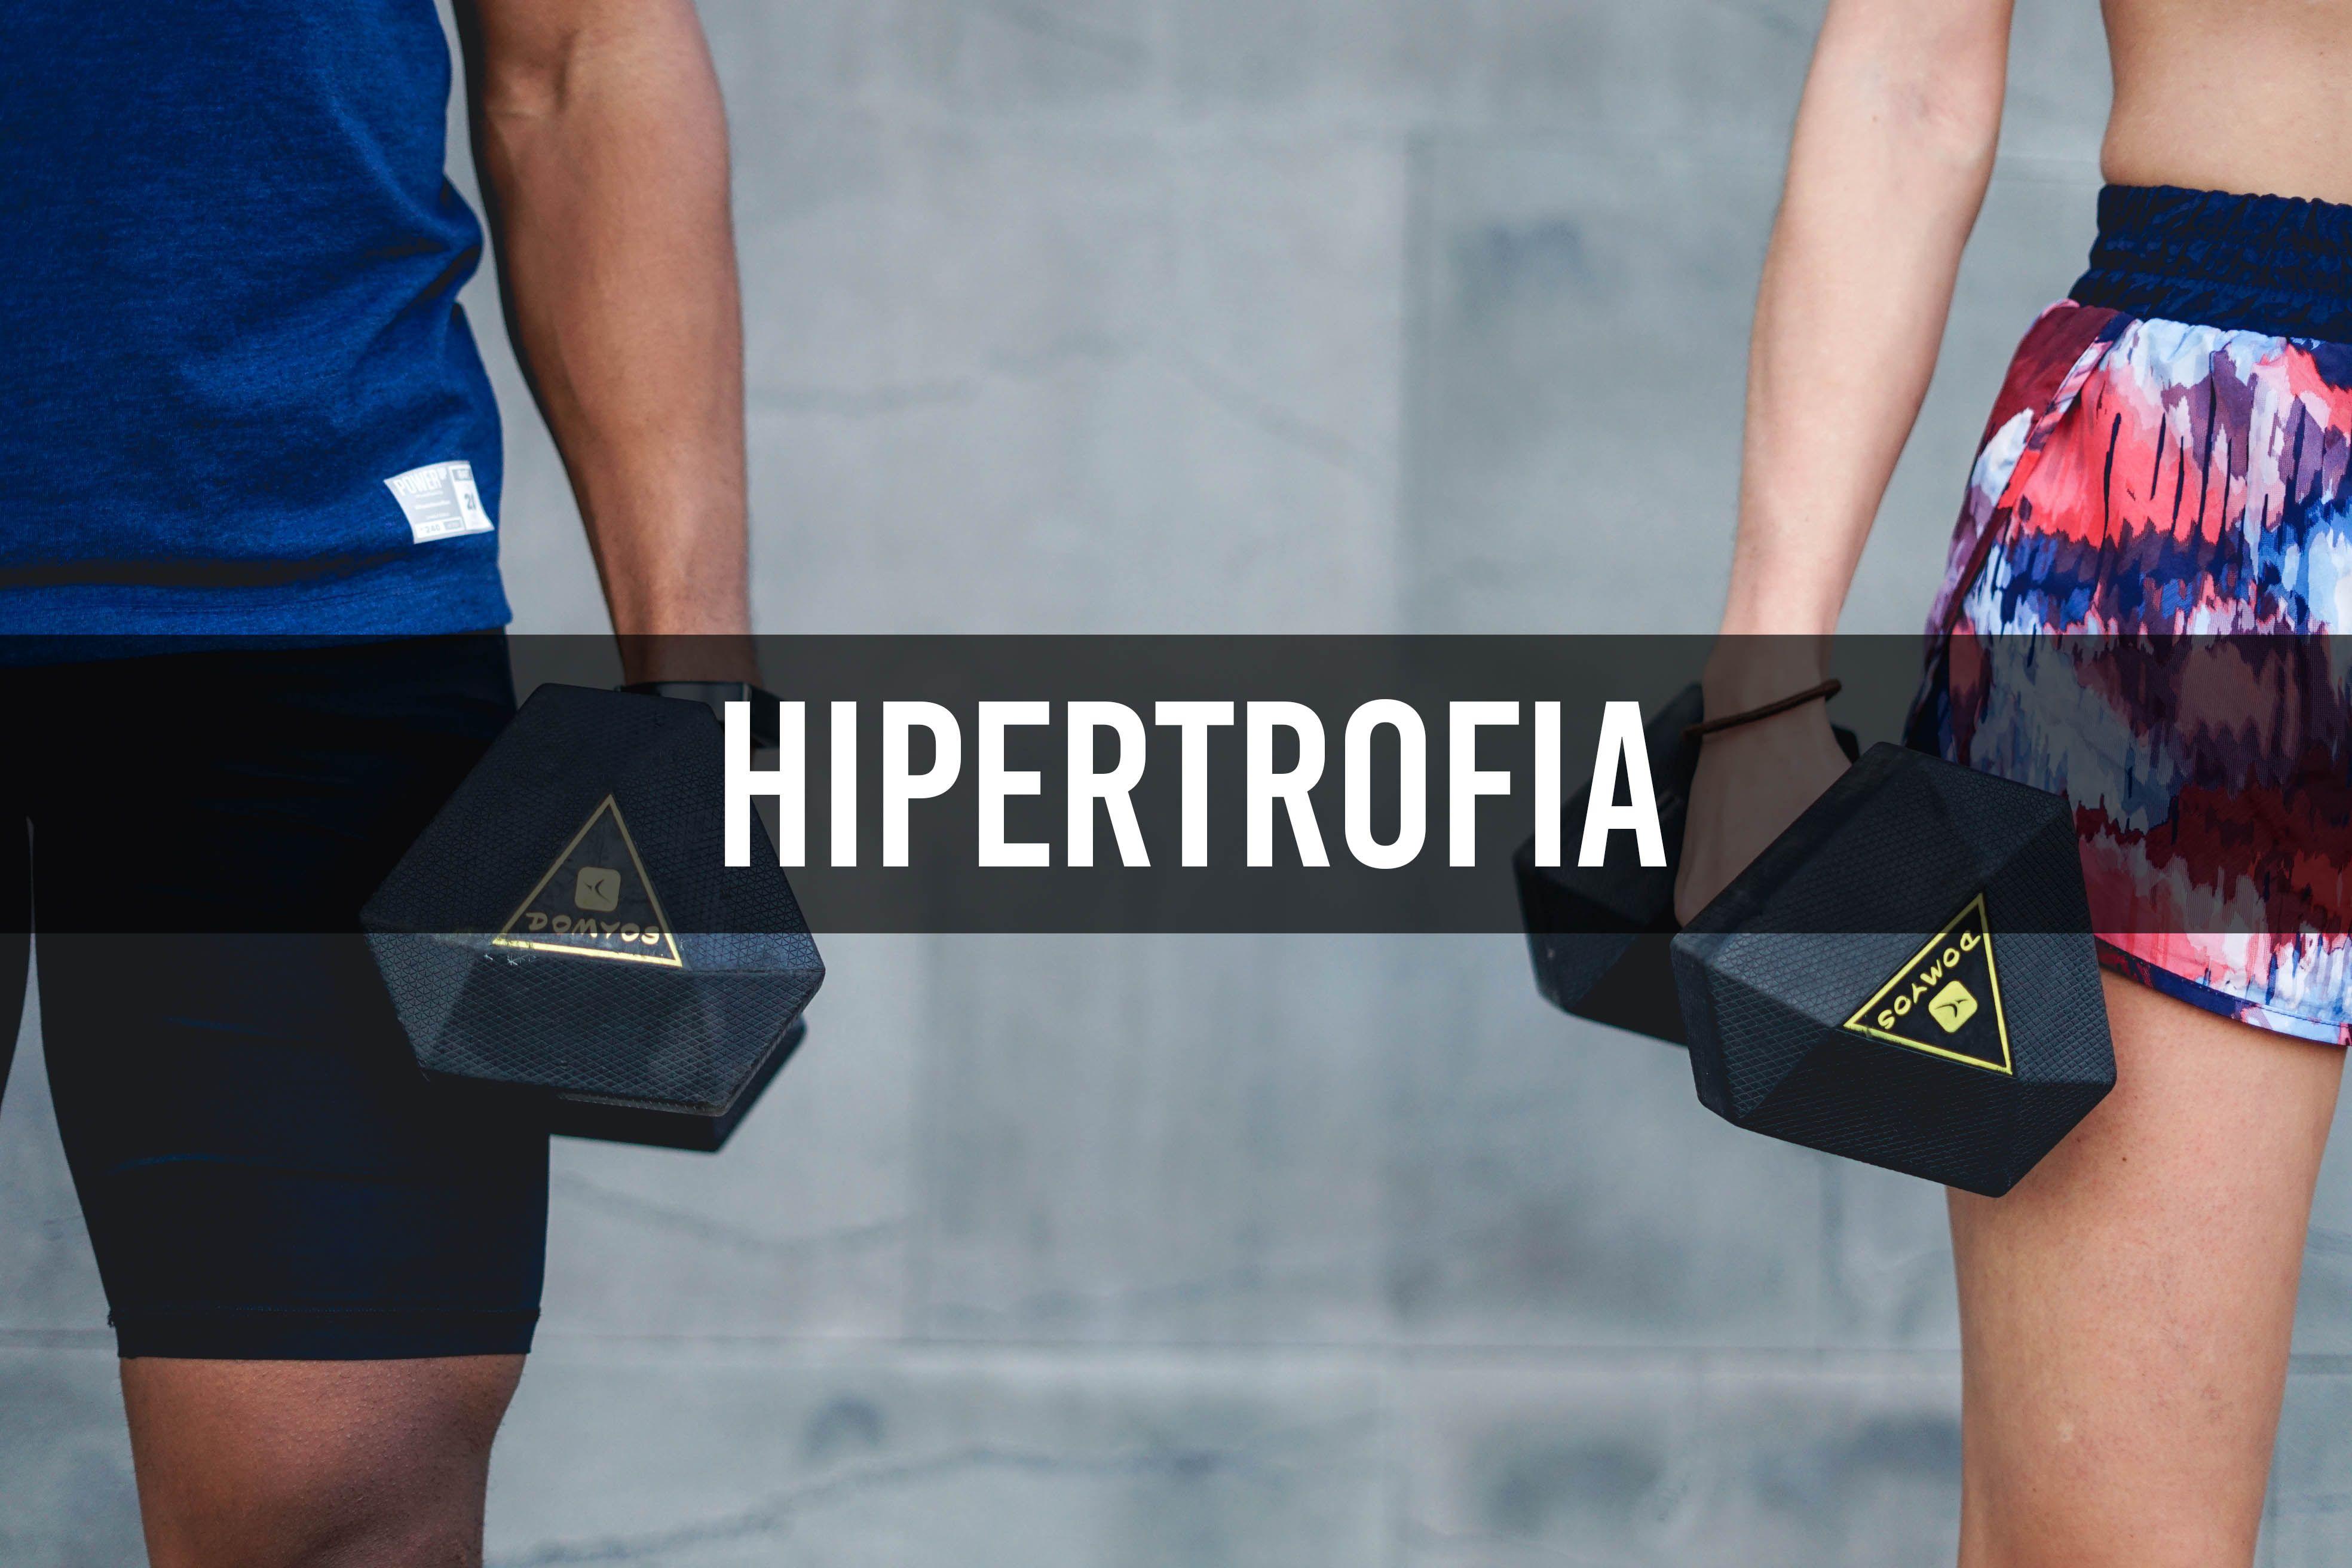 hipertrofia- Oswal